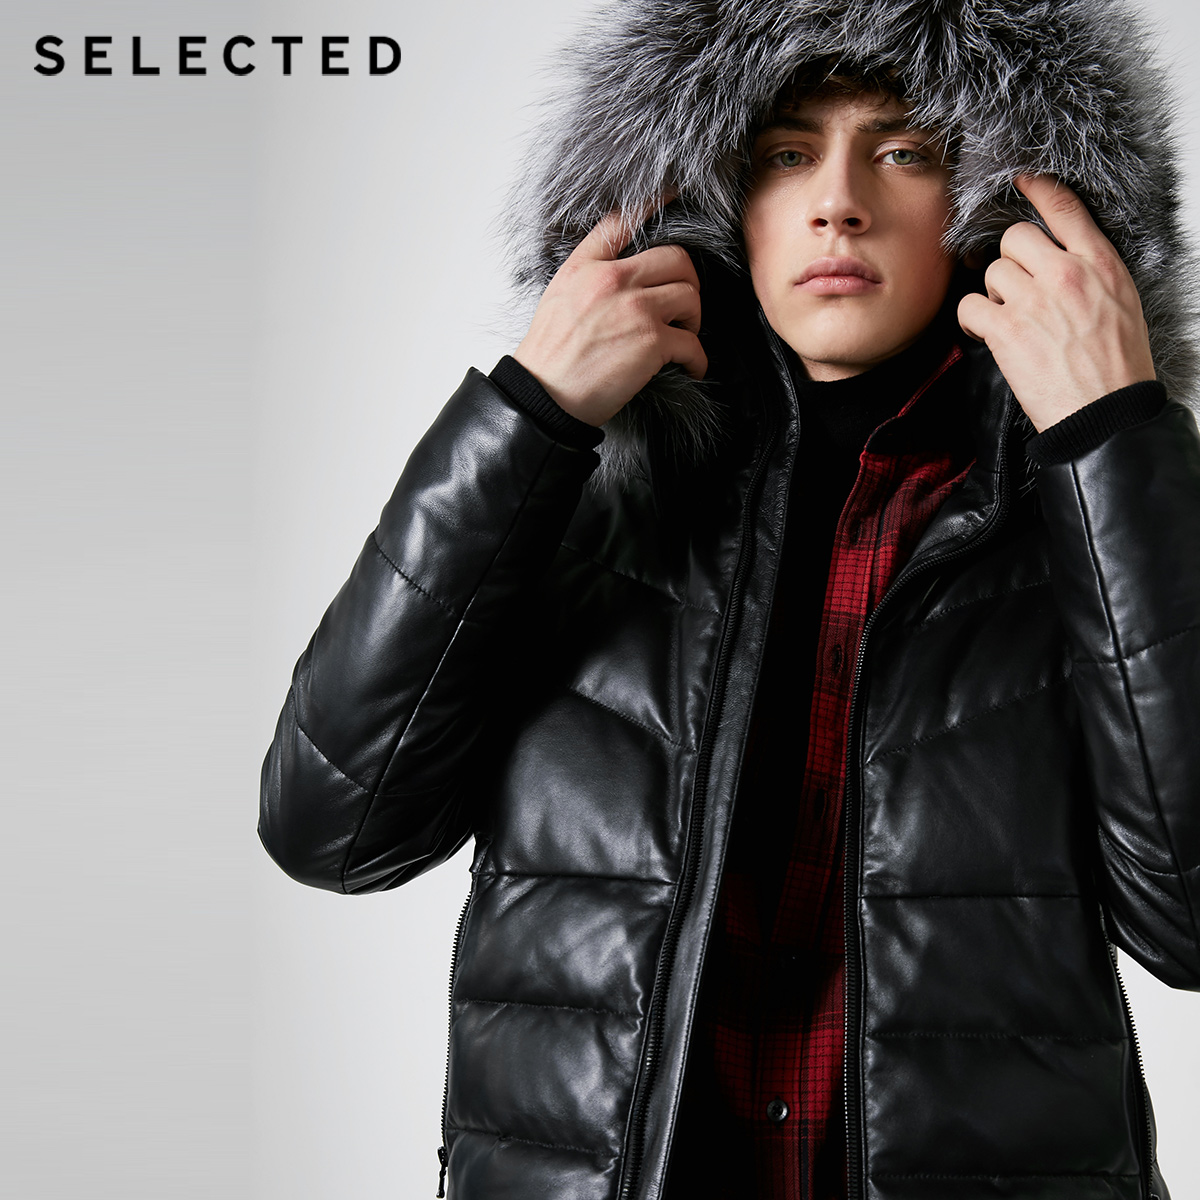 SELECTED Winter   Down   Jacket New Style Men's Fox Fur Collar Clothes Sheepskin Short   Down   Suit   Coat   S|418412568